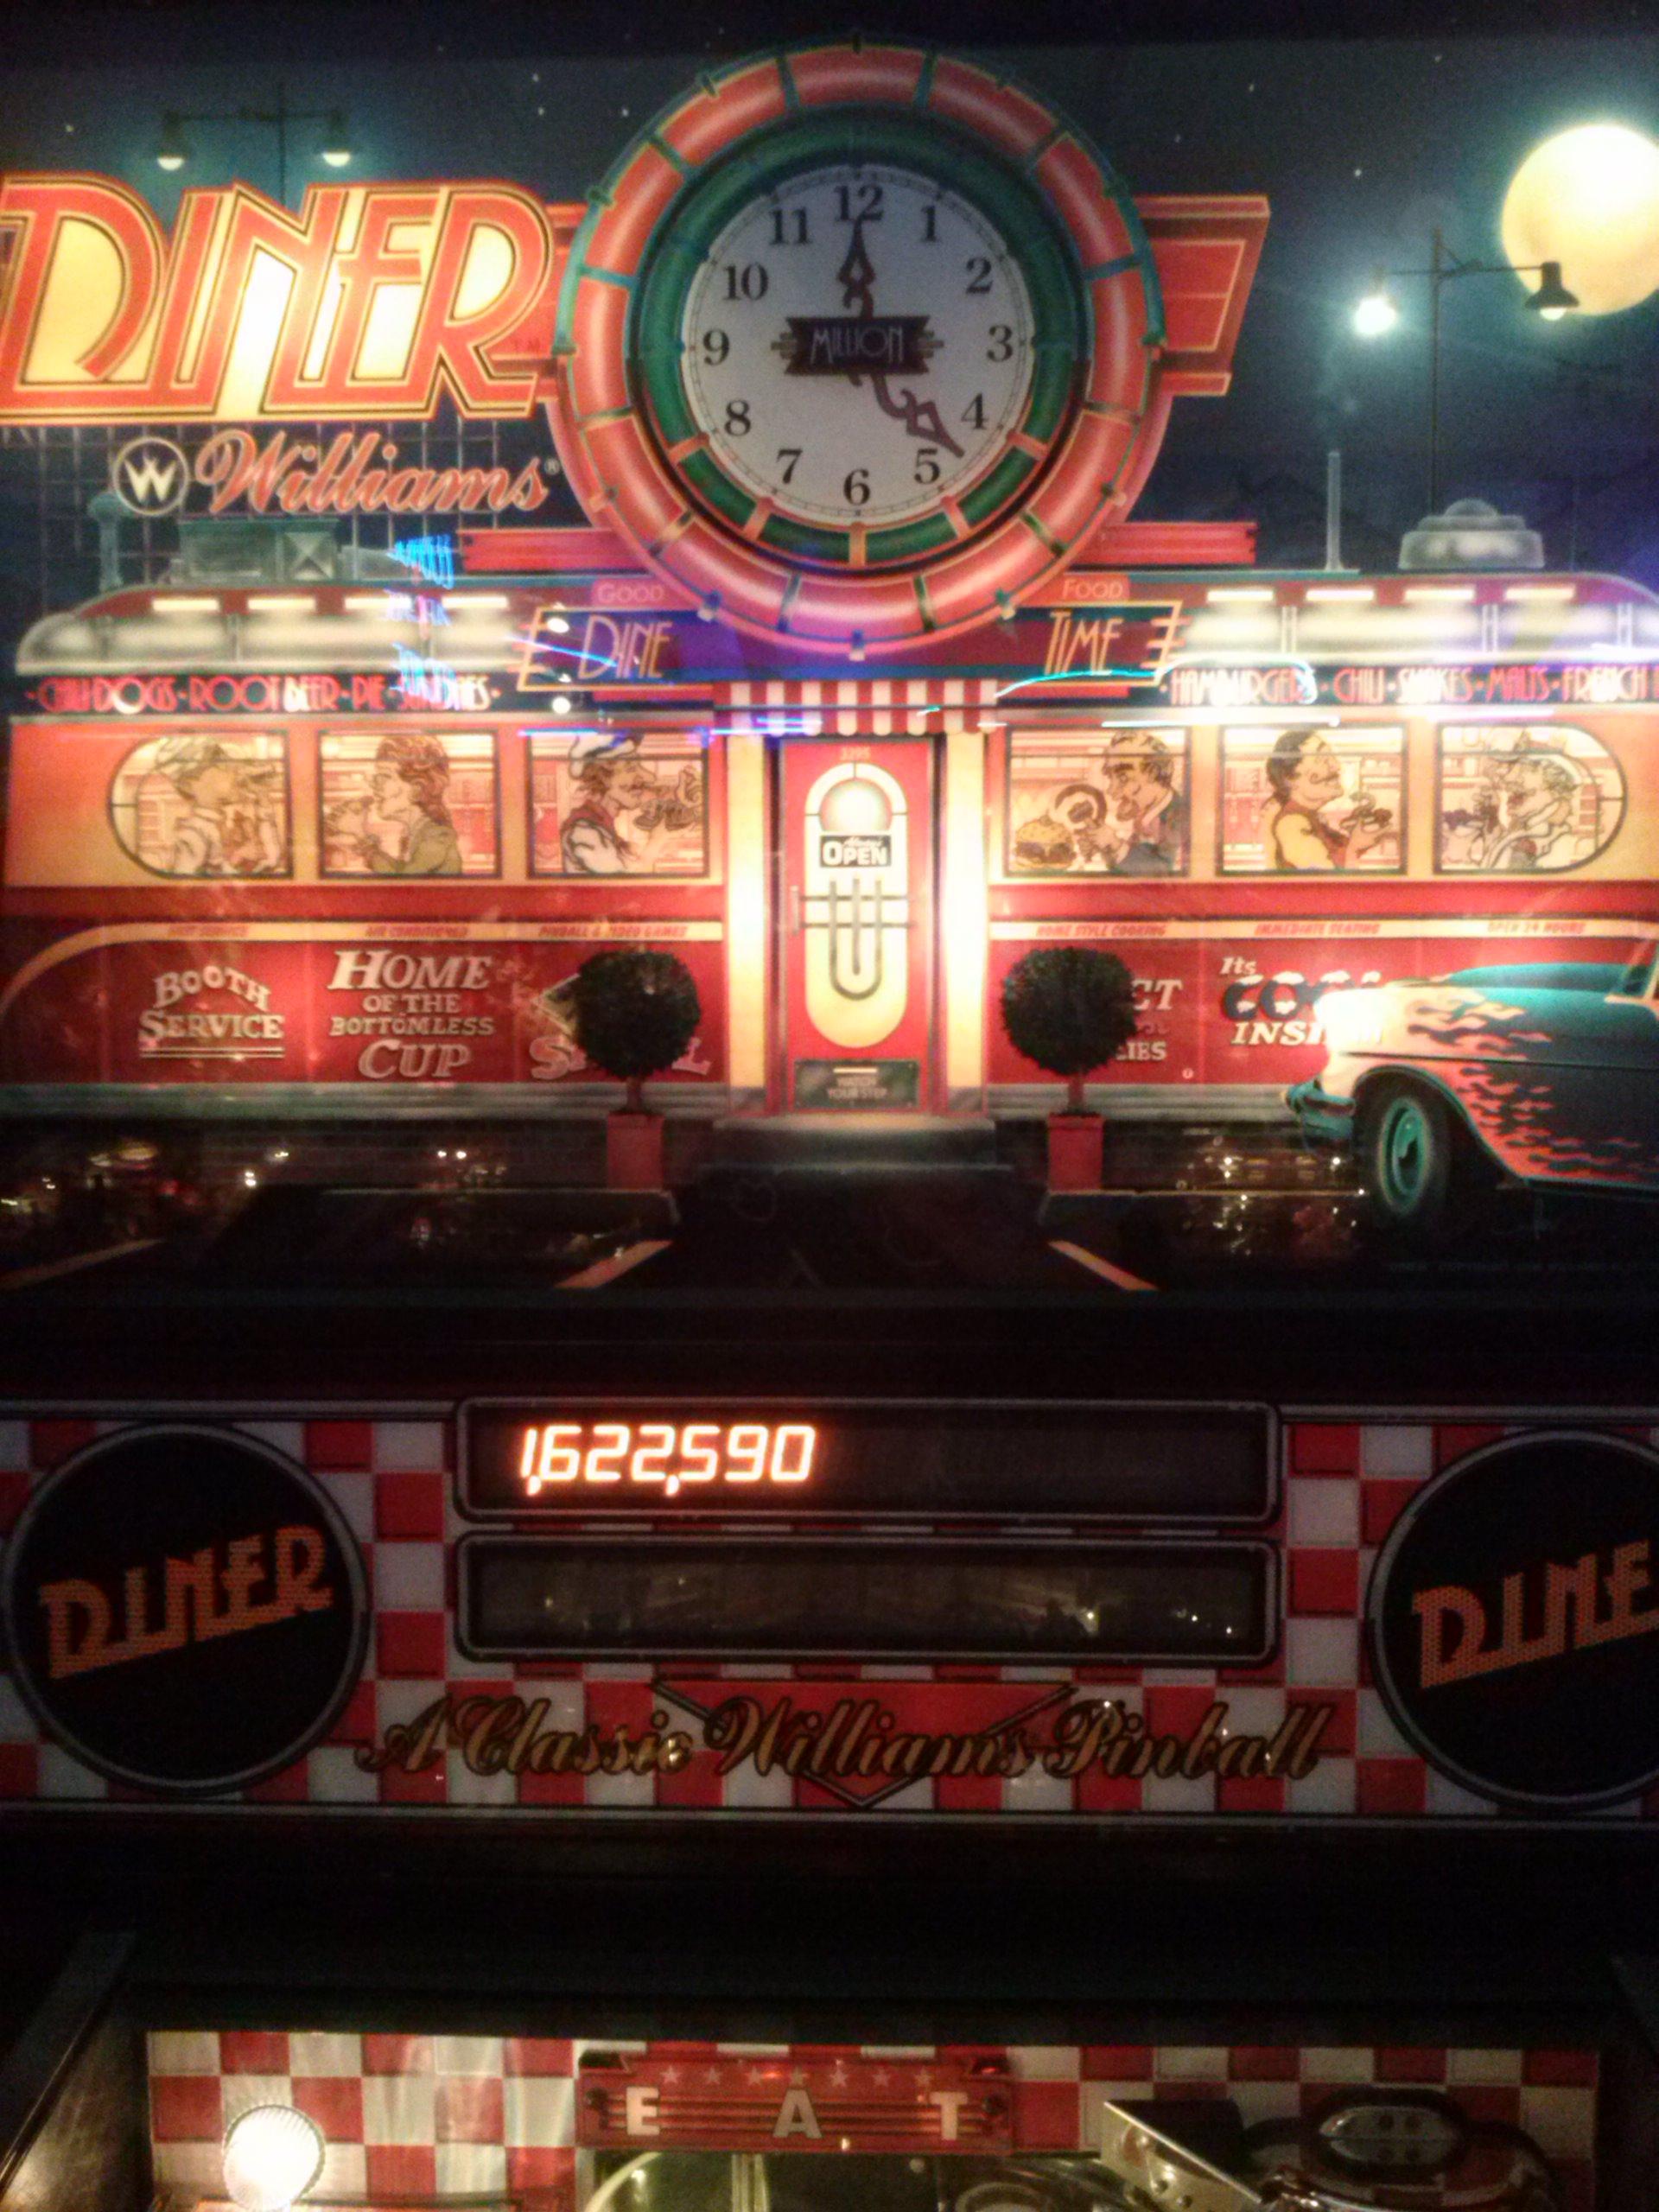 nester: Diner (Pinball: 3 Balls) 1,622,590 points on 2014-05-20 14:38:29